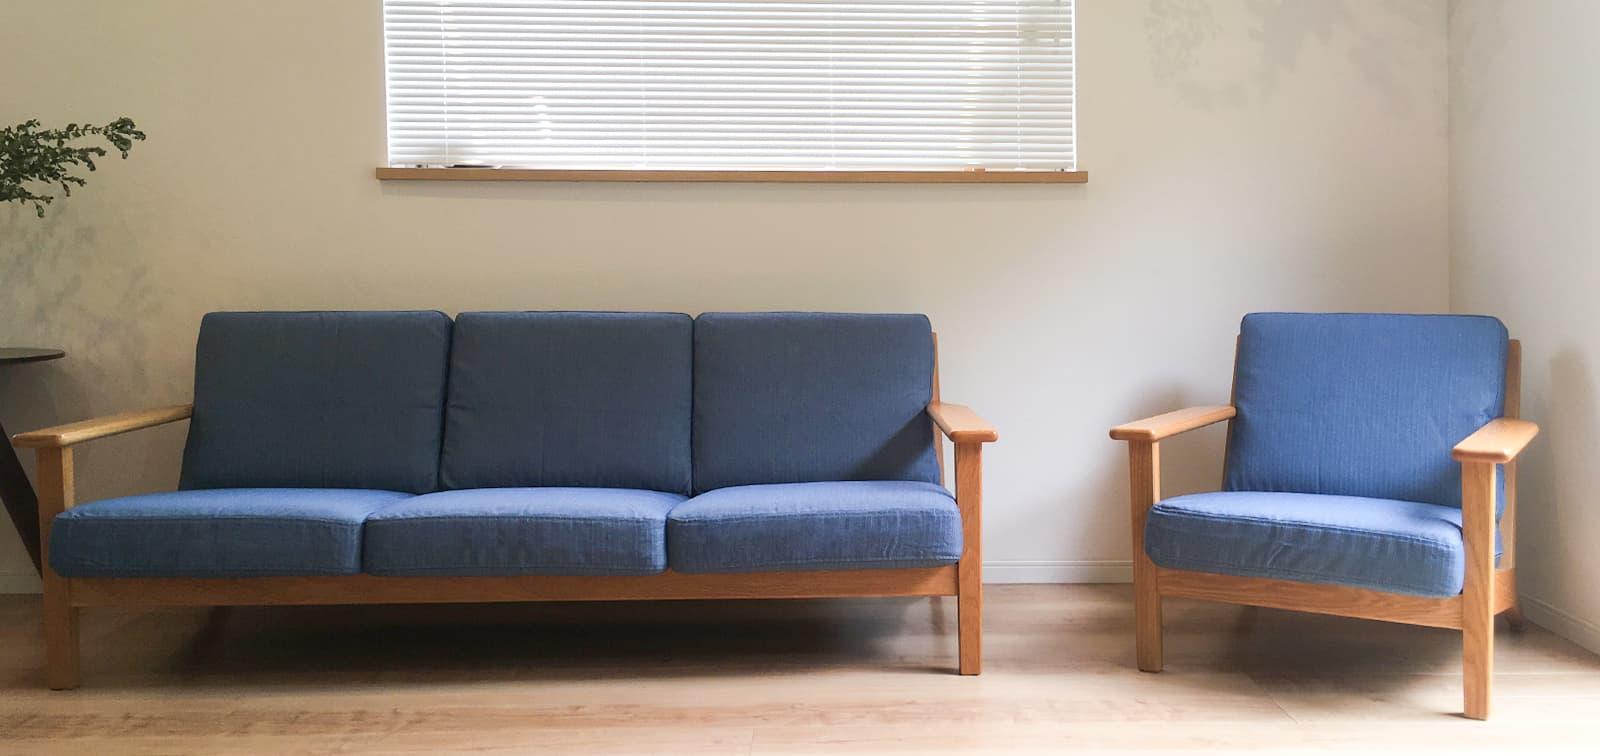 IKEA Ektorp 3 Seater Sofa in Rouge Indigo Velvet Sofa Slipcover